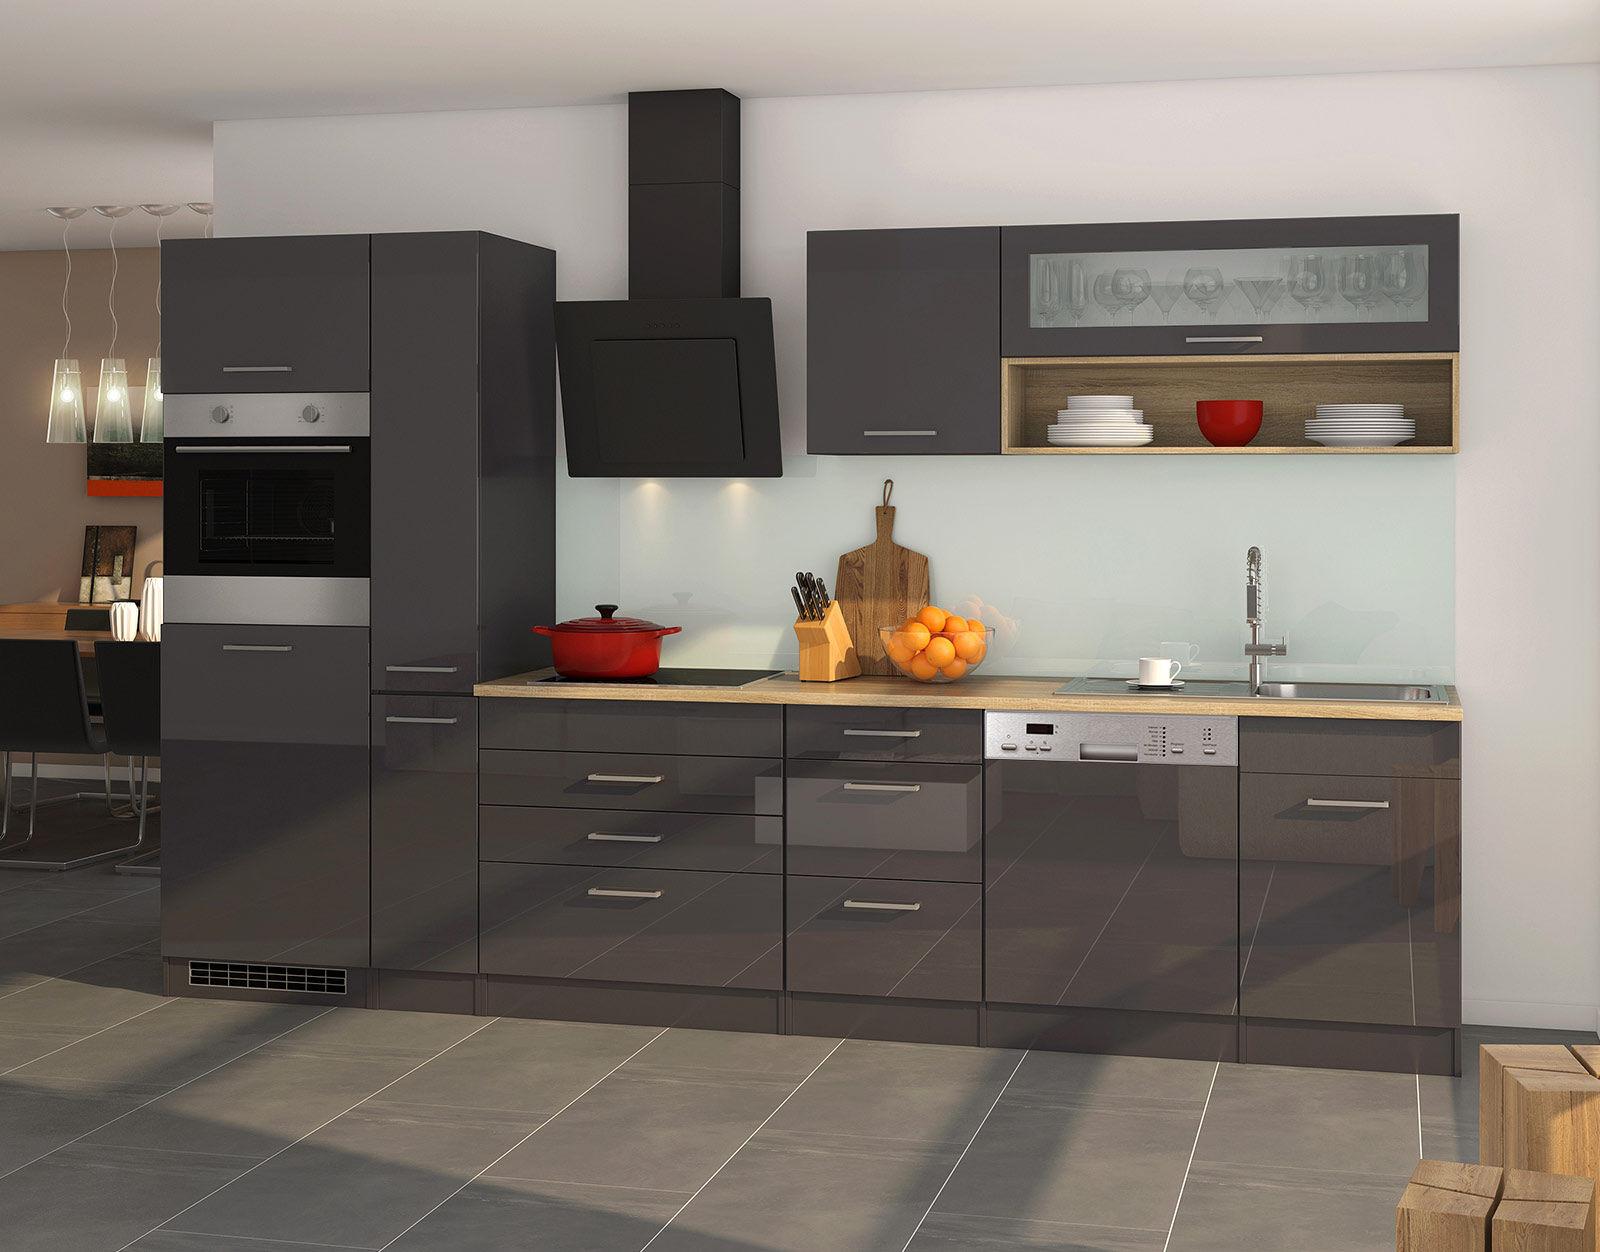 Lifestyle4Living Küchenblock, grau Hochglanz, Stellmaß: ca. 330 cm, mit Elektrogeräten inkl. Geschirrspüler